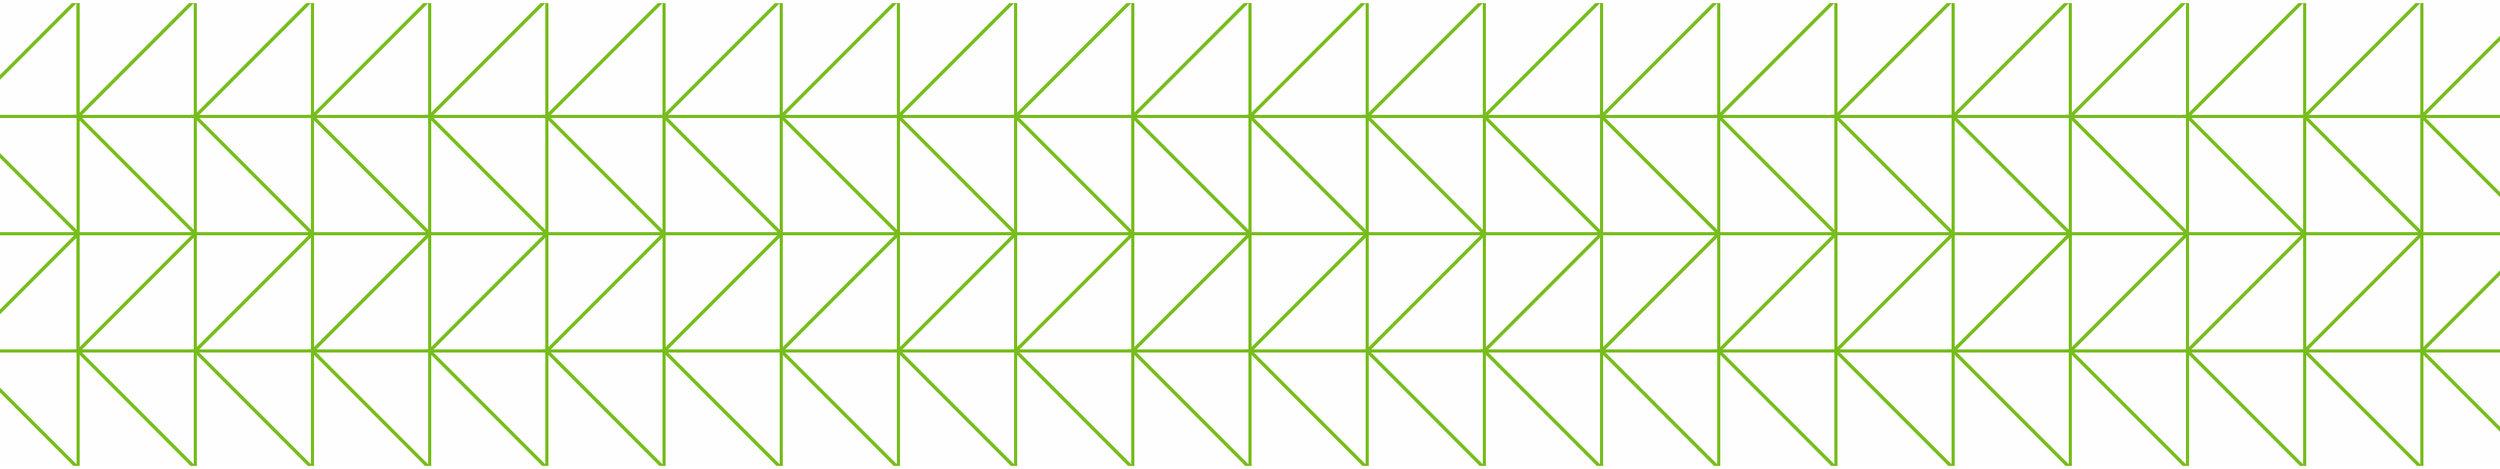 coa-pattern_02@2x.jpg